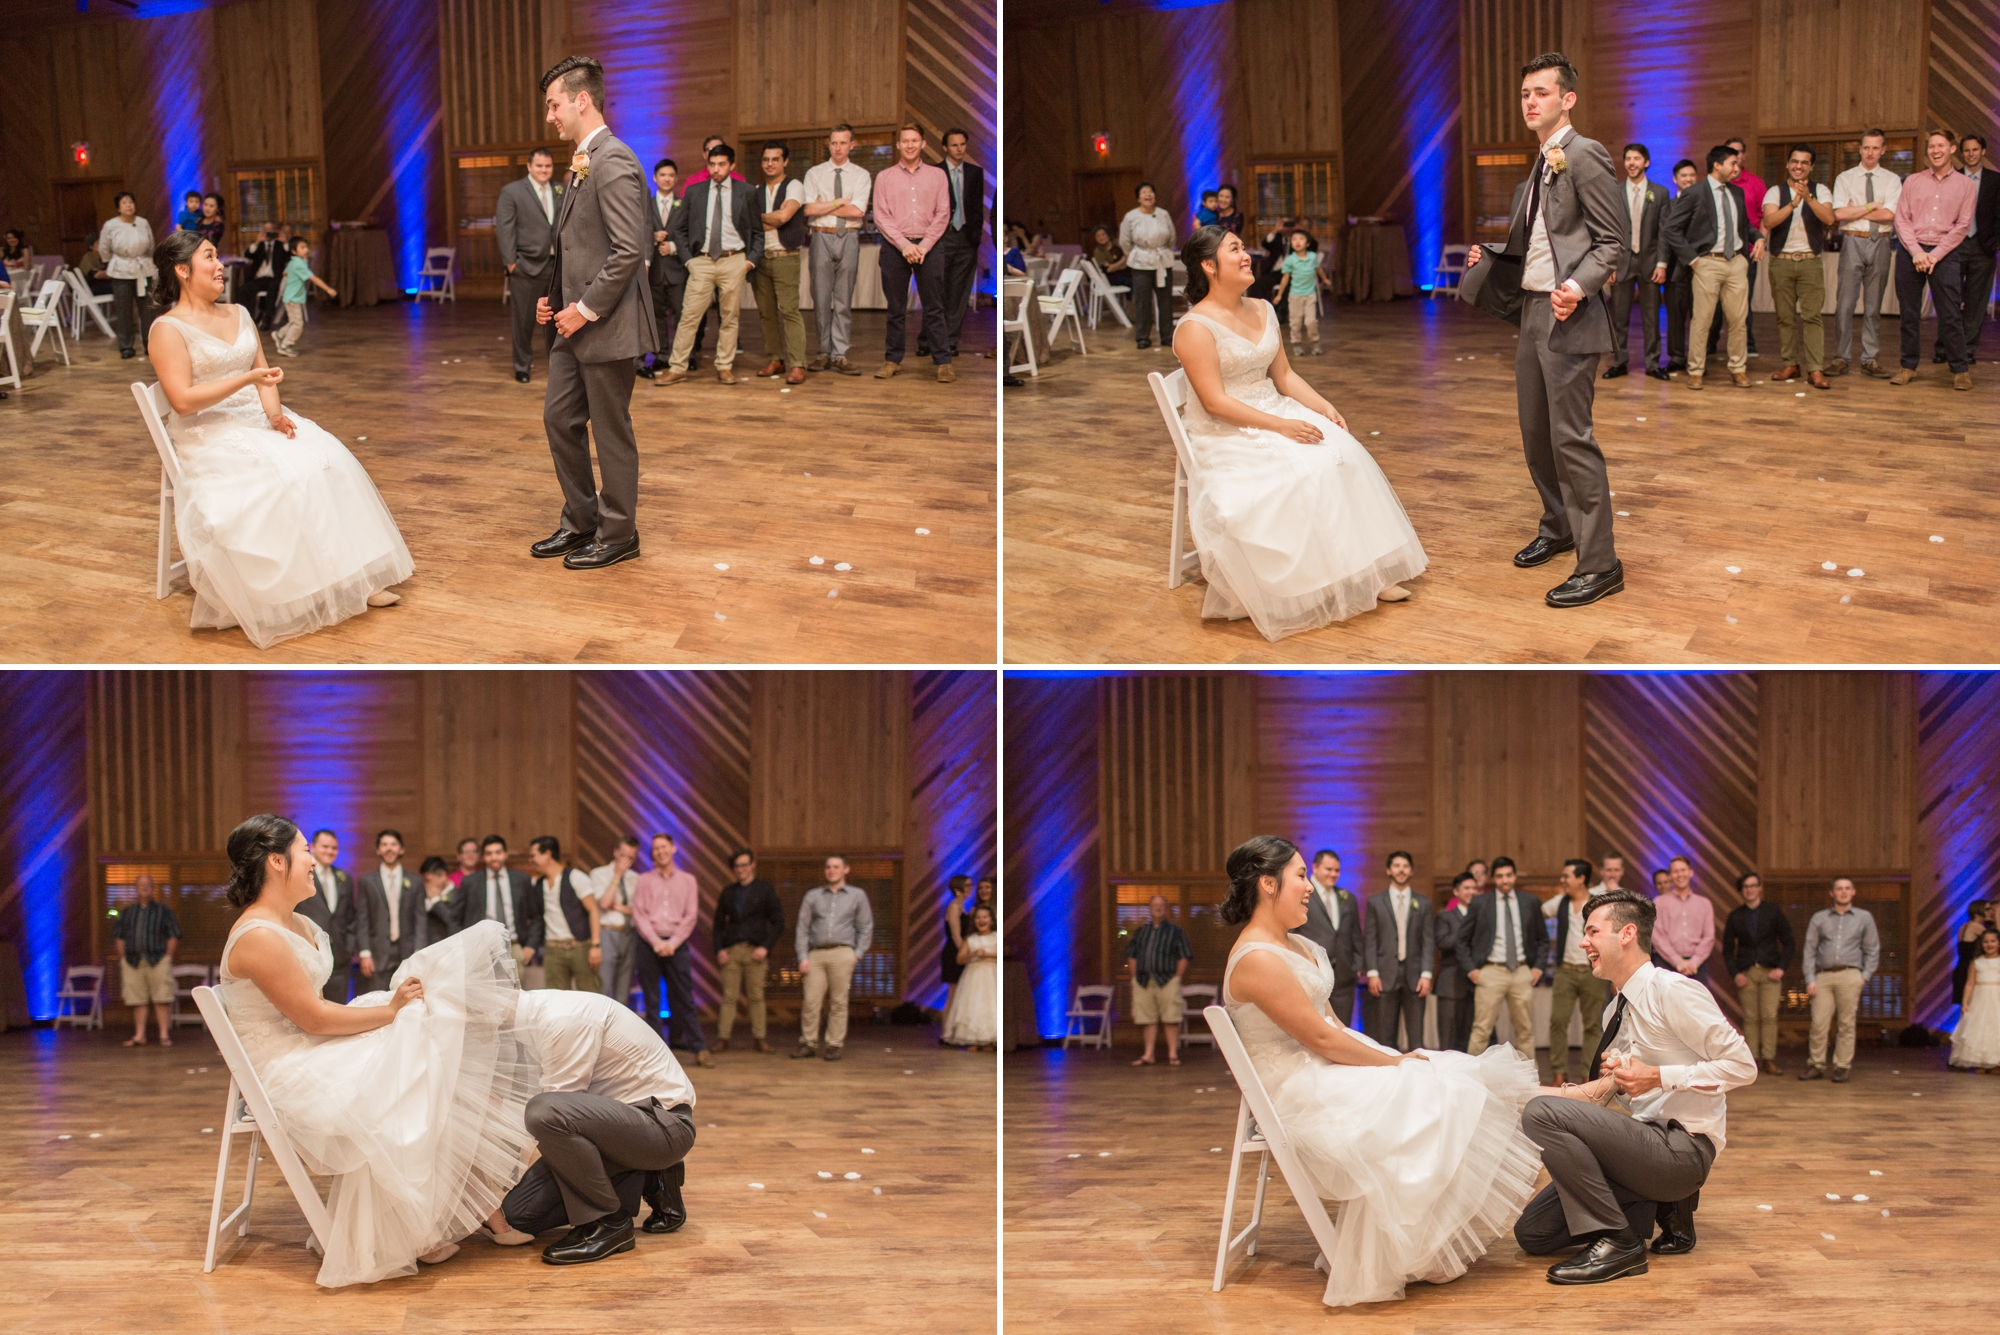 giles wedding blog 49.jpg